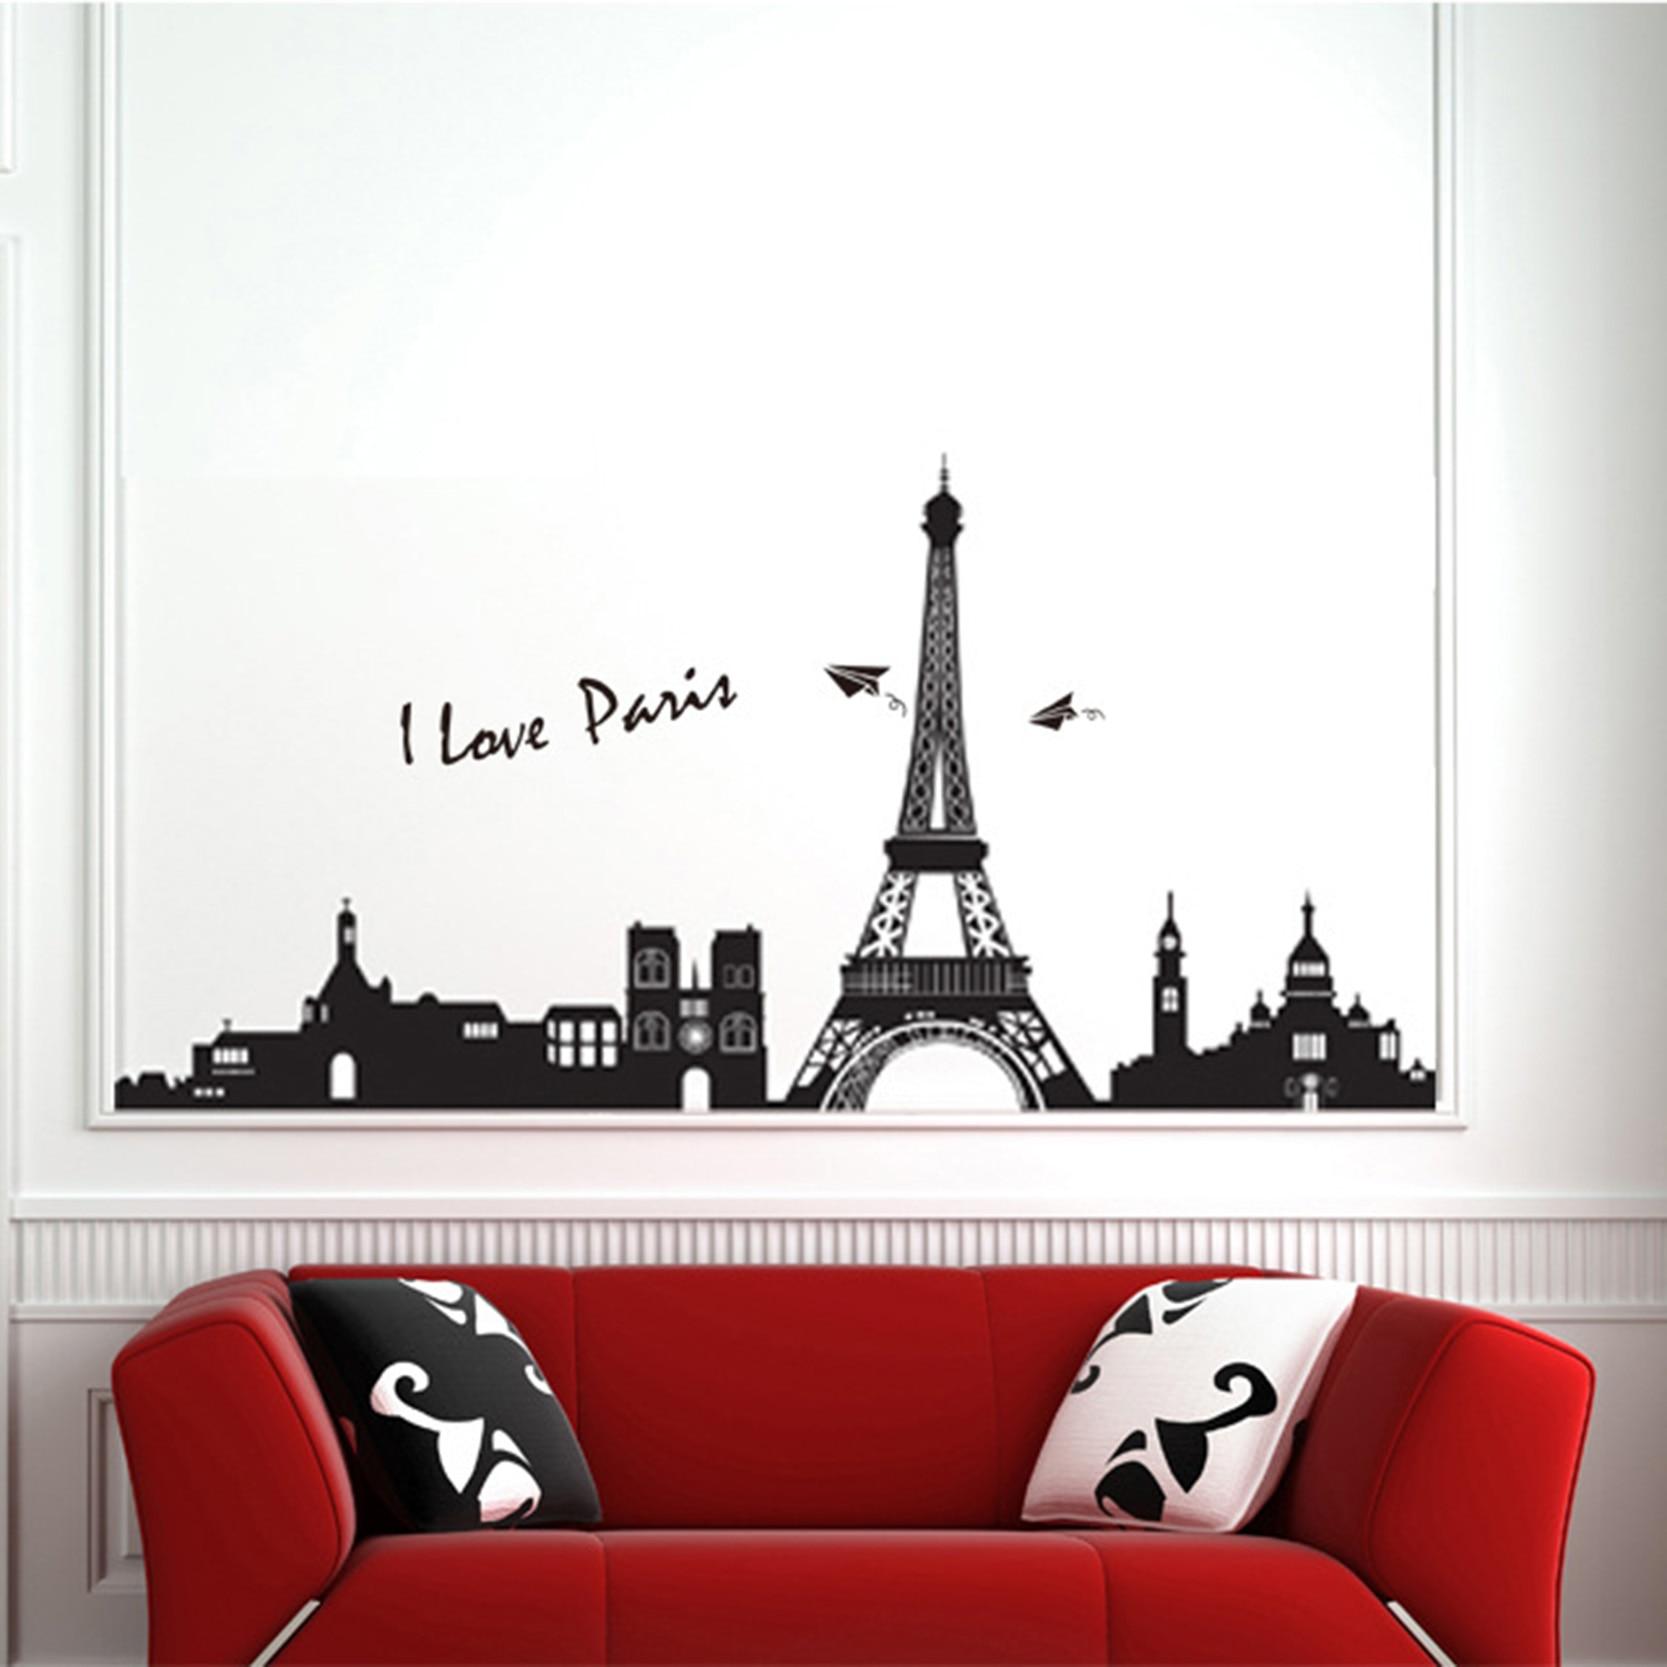 Paginas decoracion hogar free texturas para web impresin - Paginas decoracion hogar ...